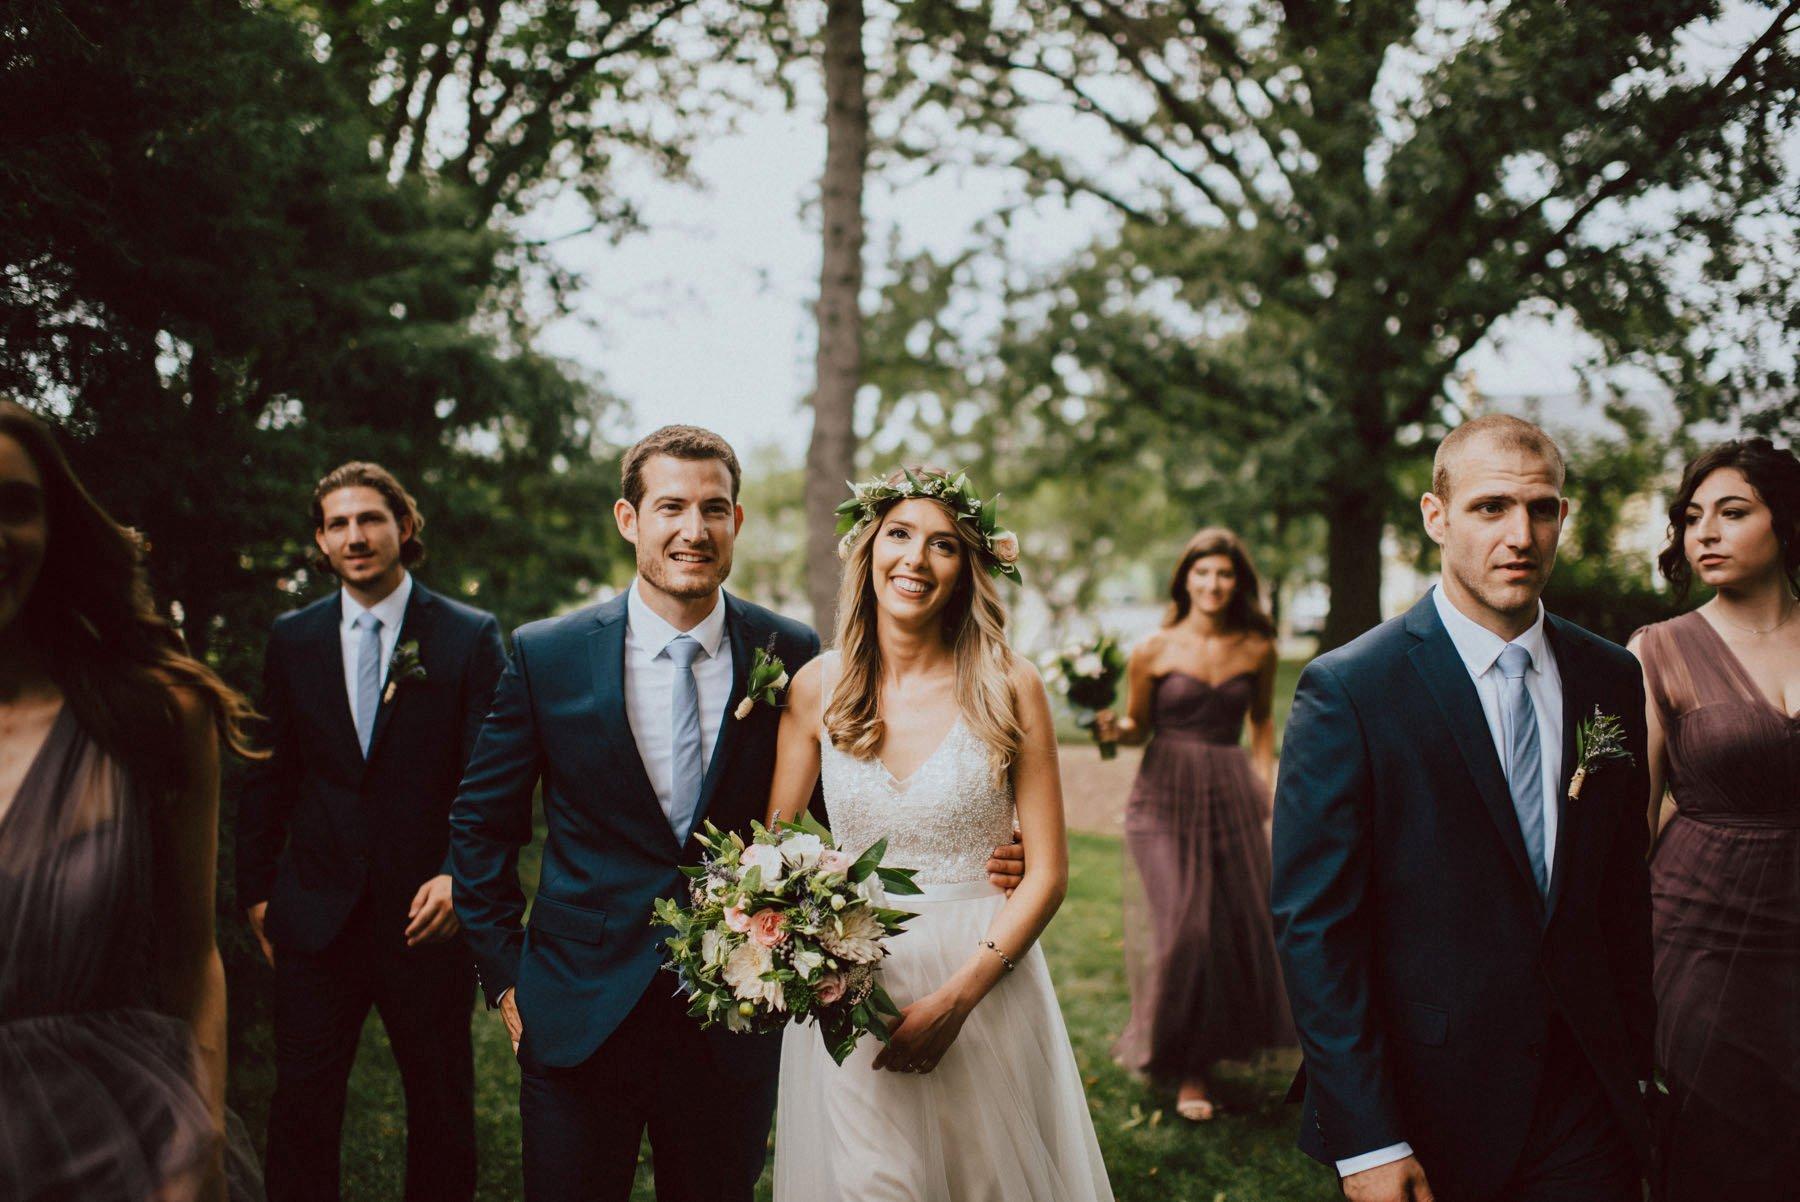 Knowlton-mansion-wedding-68.jpg